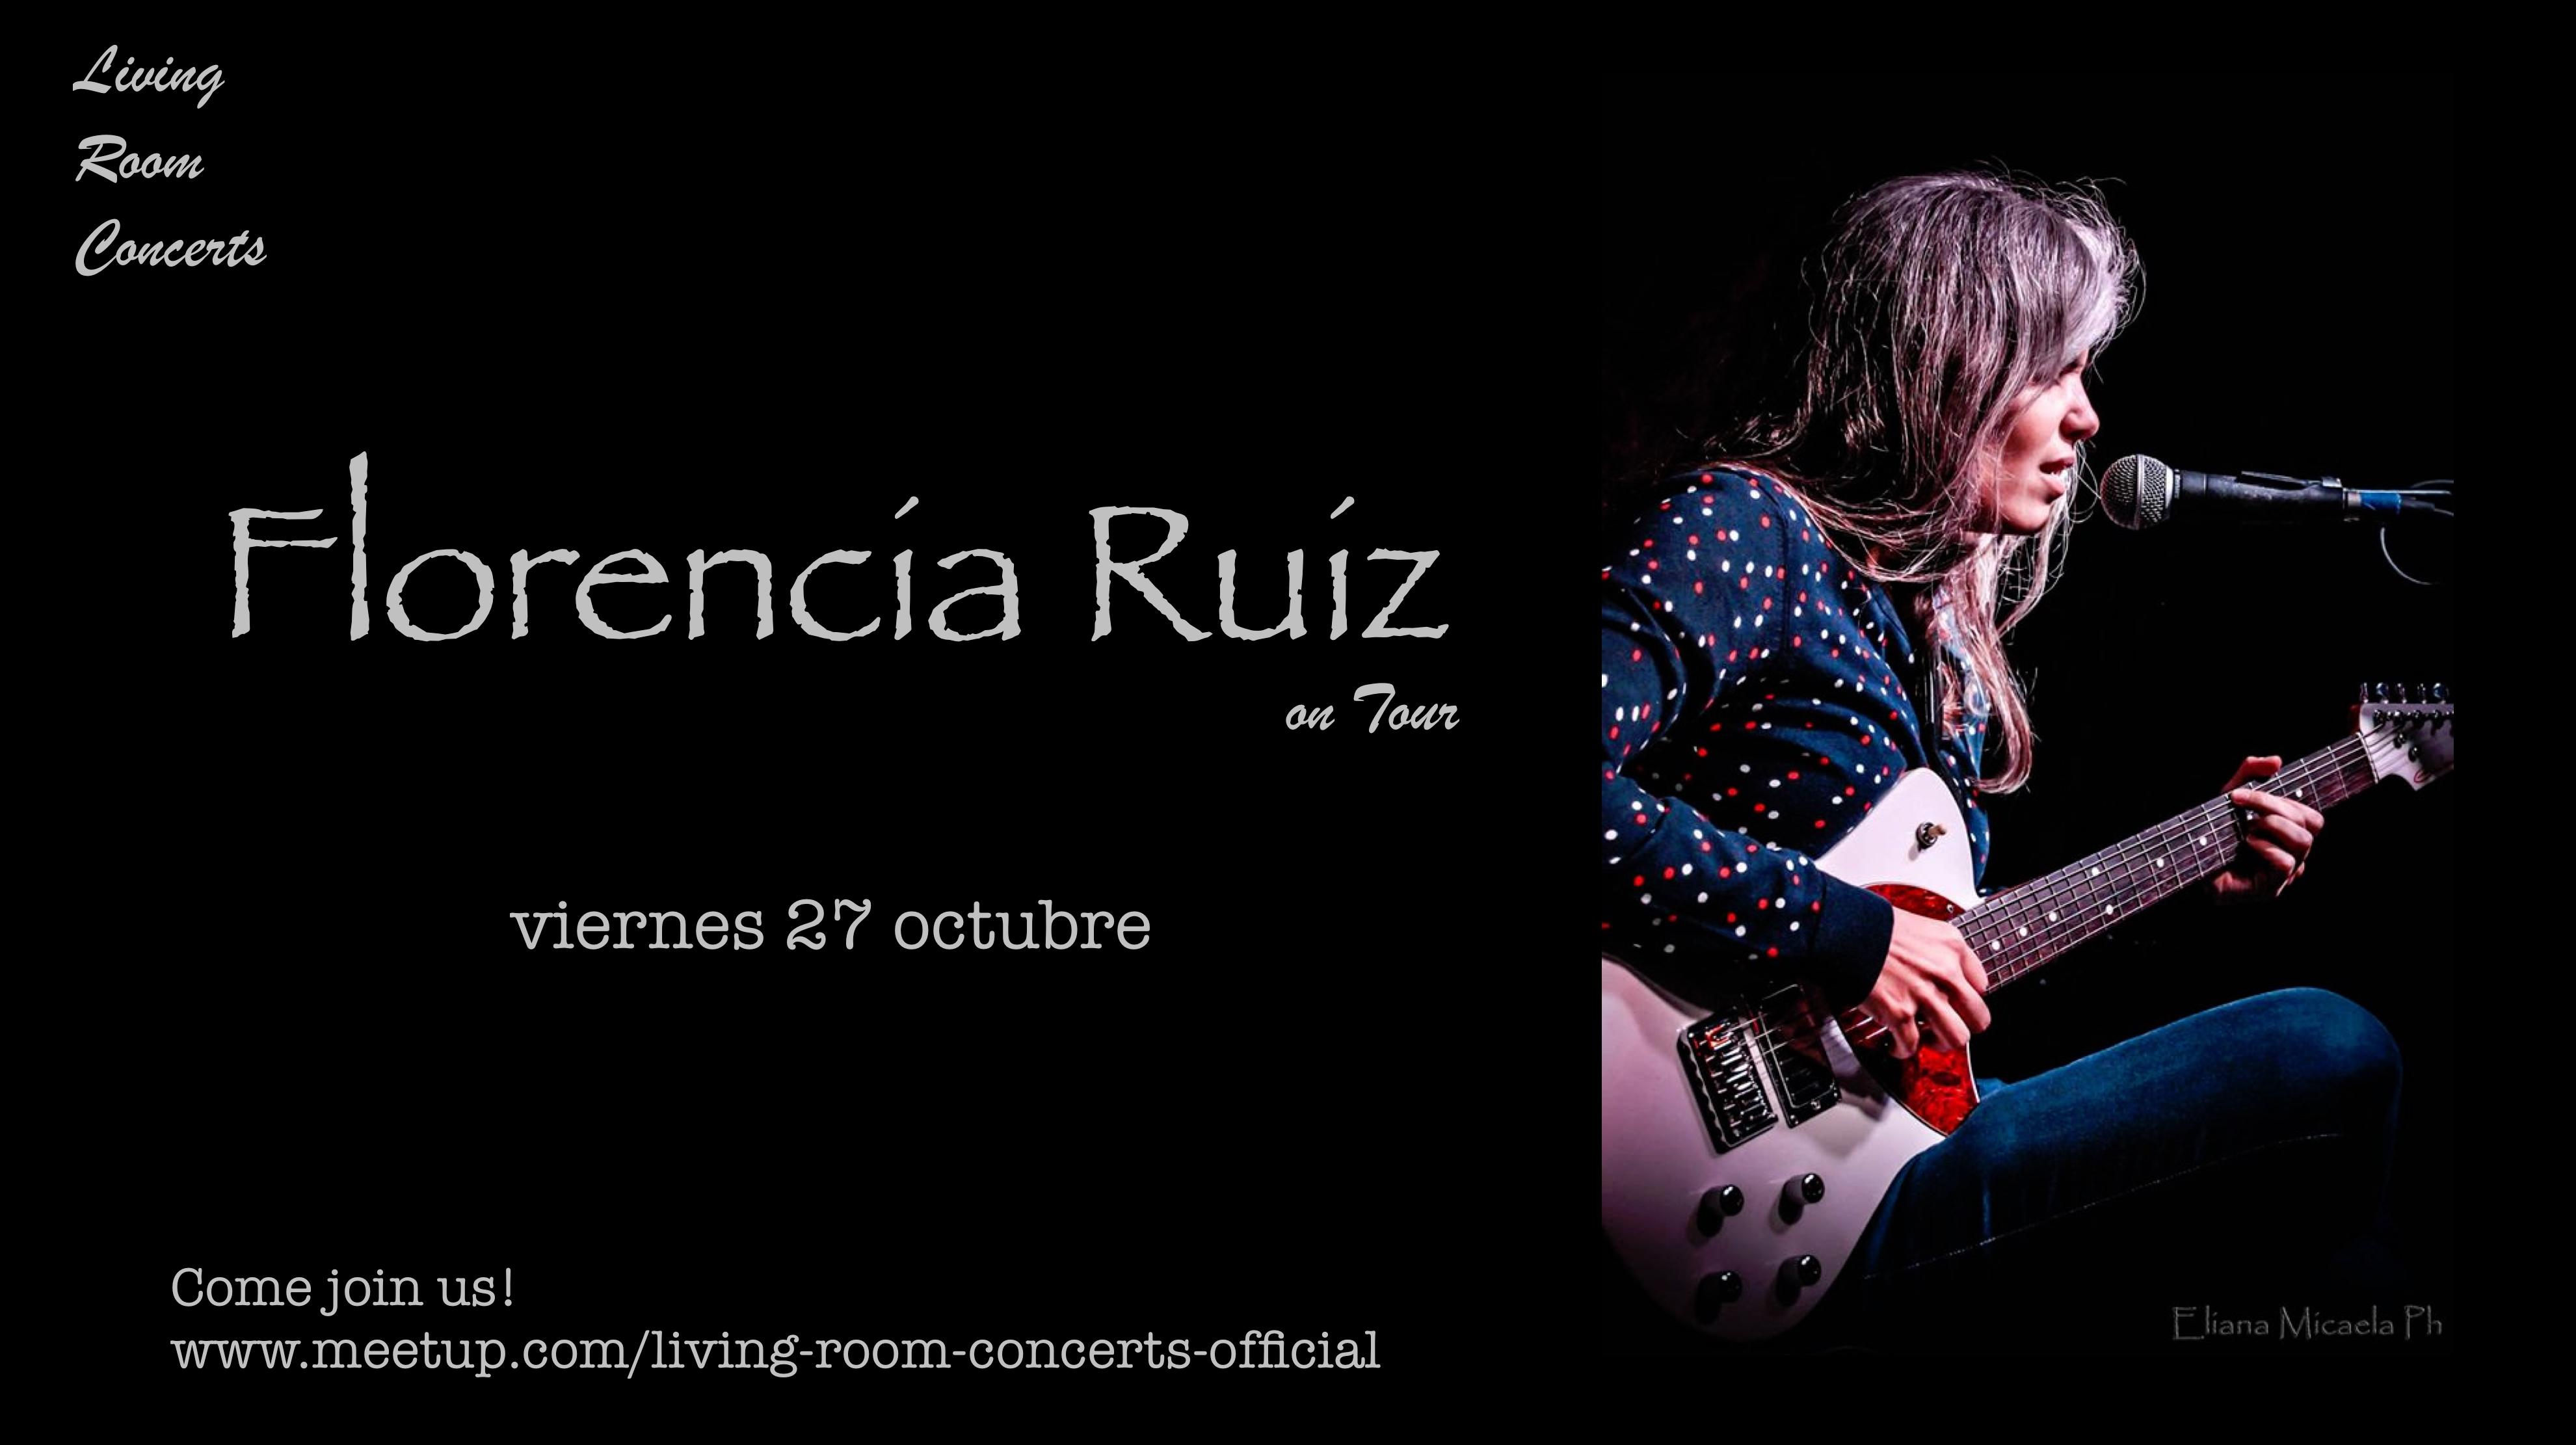 living room concerts. 27 October  Florencia Ruiz on Tour Living Room Concerts Events Style My Life